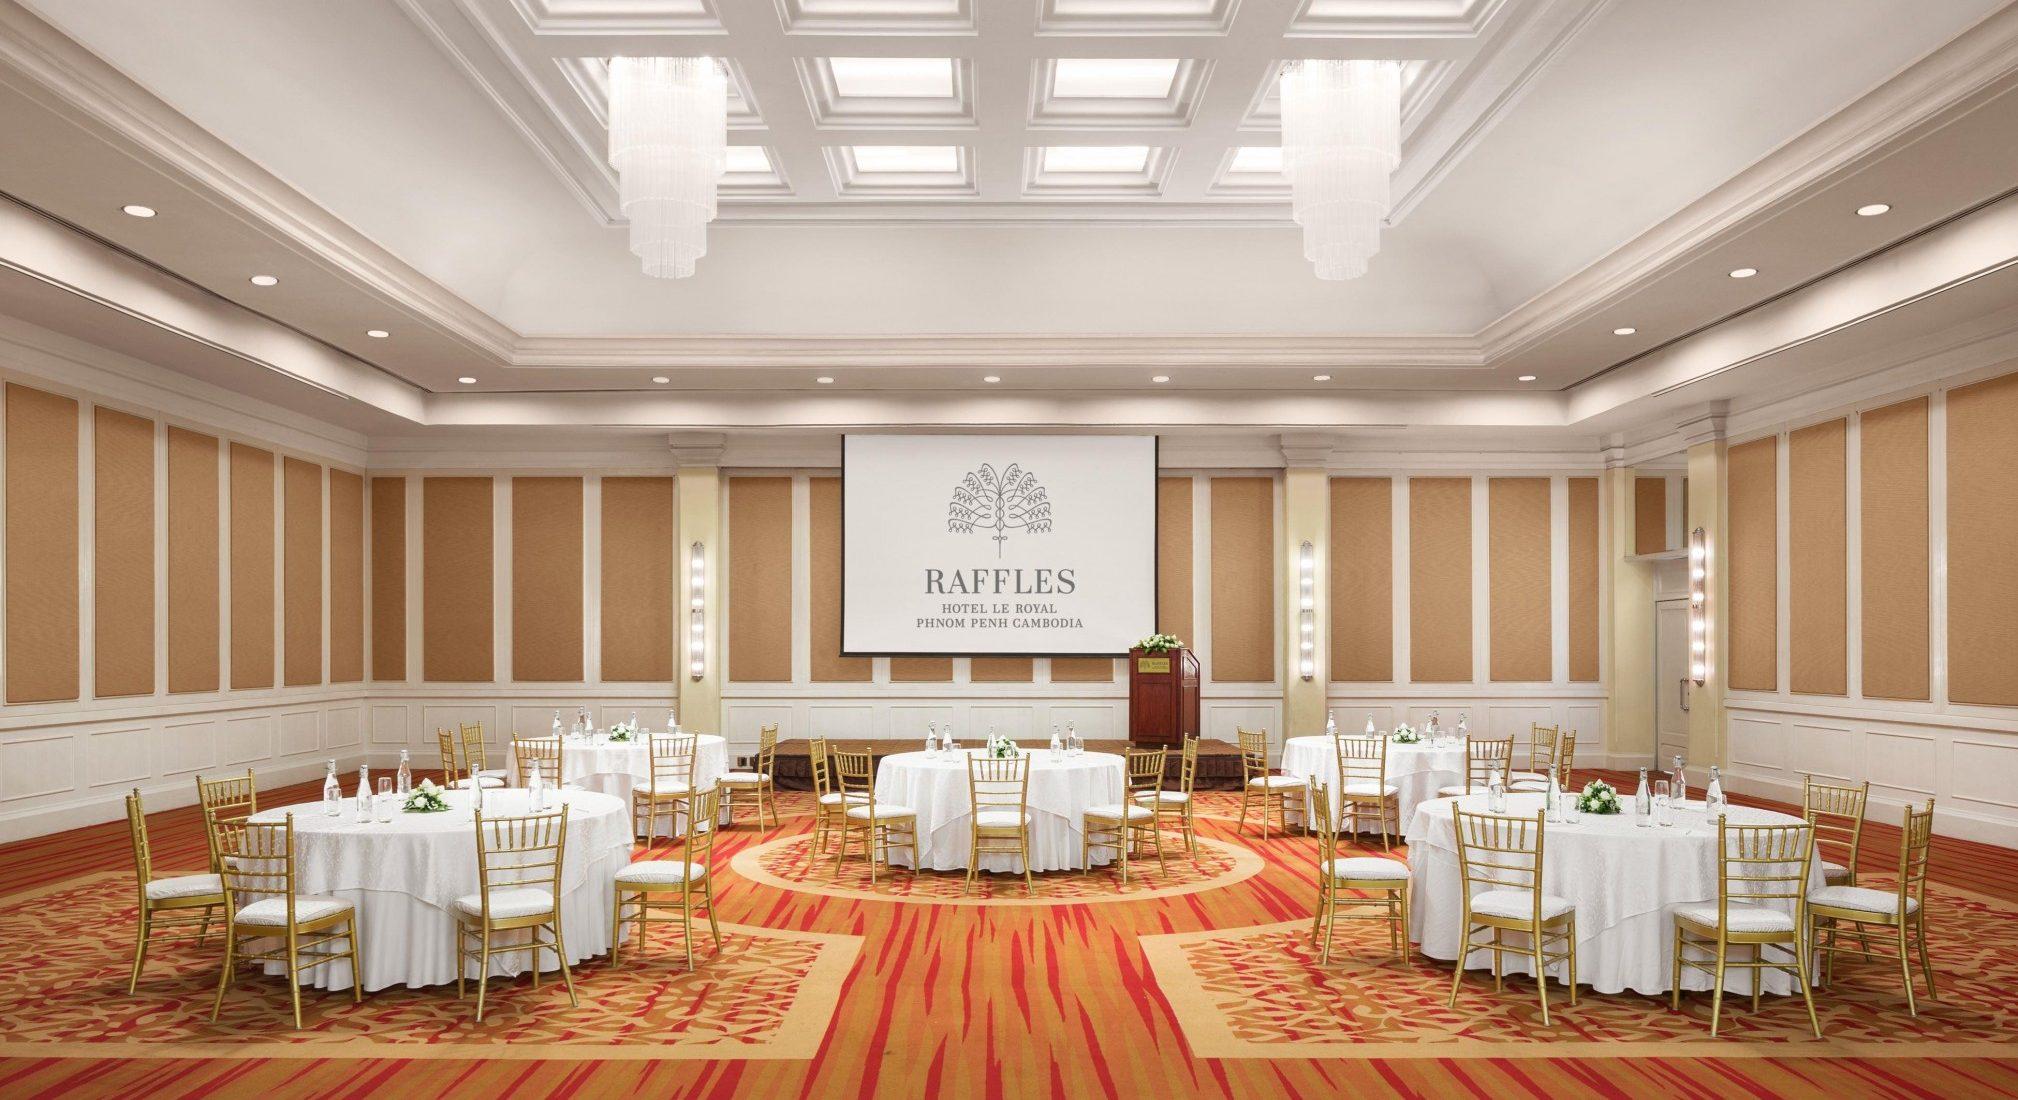 Raffles Hotel Le Royal Phnom Penh - Raffles Weddings